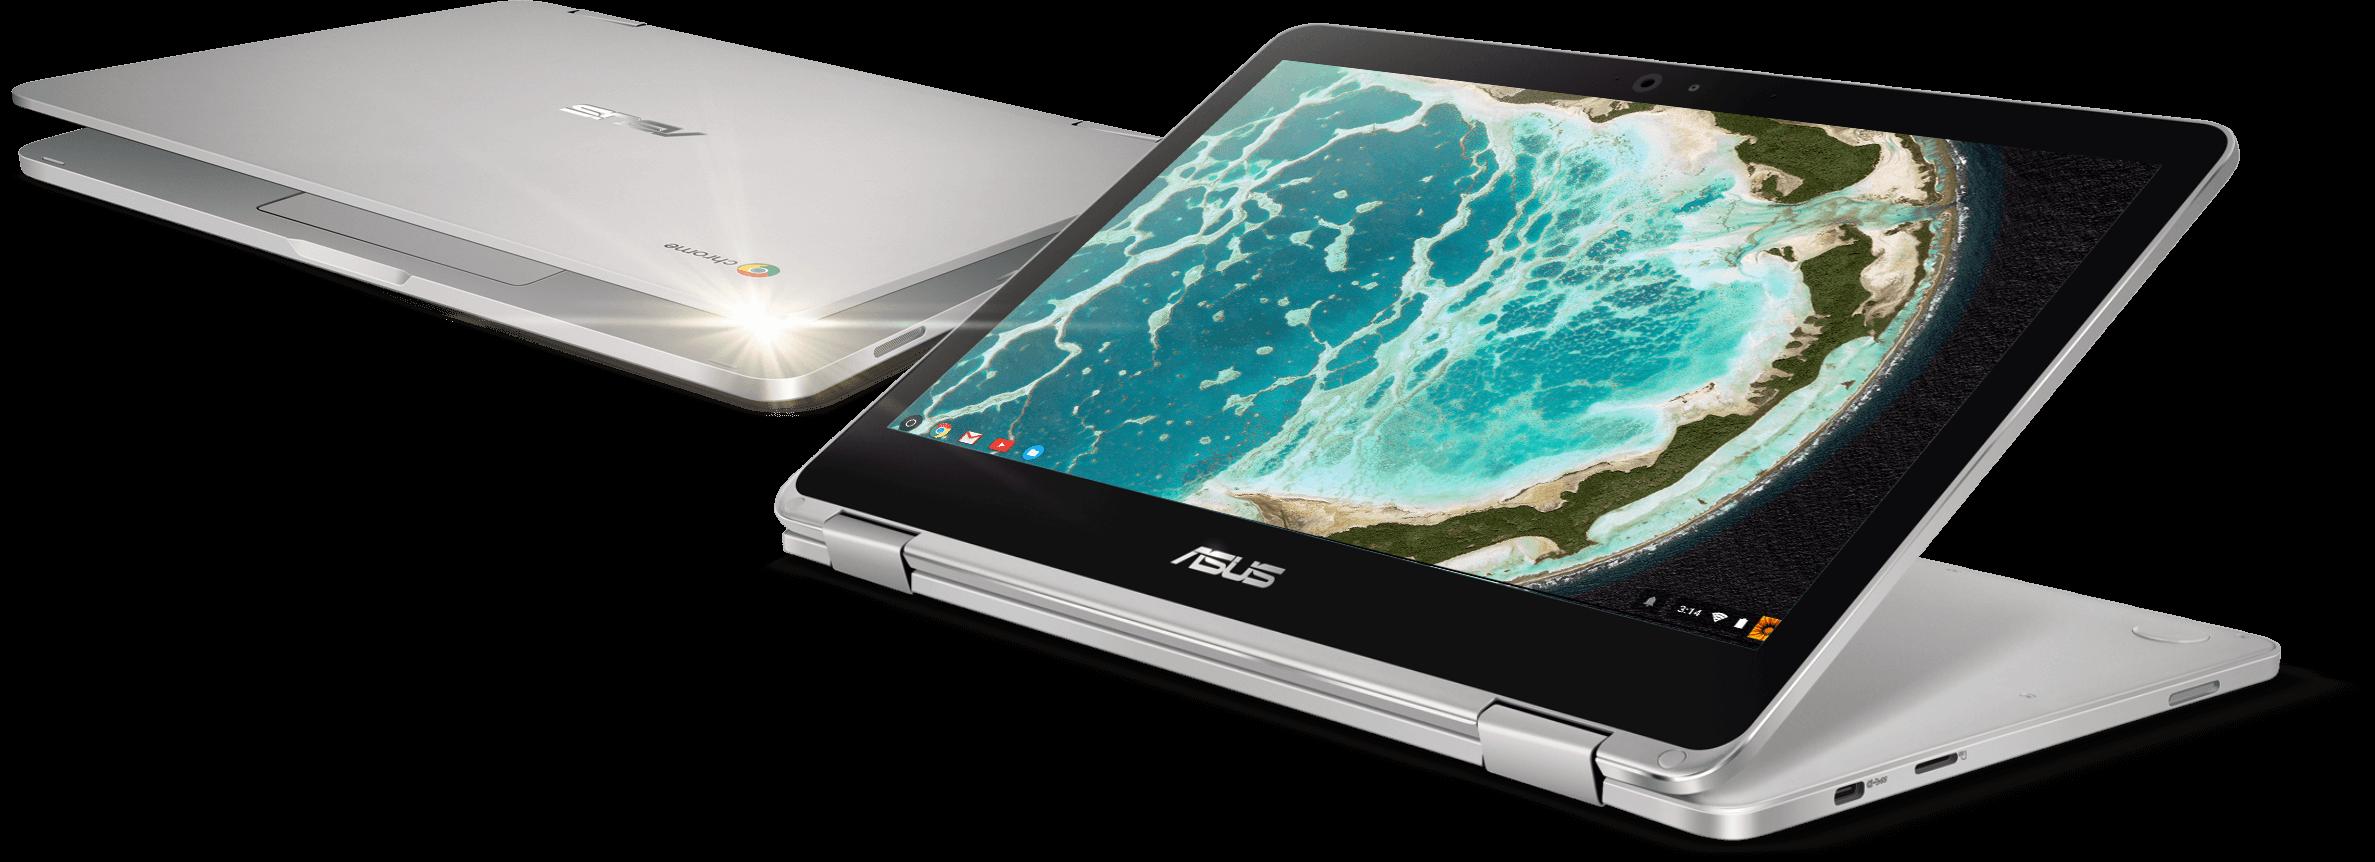 Buy Chromebook Flip C302 | ASUS Shop Australia